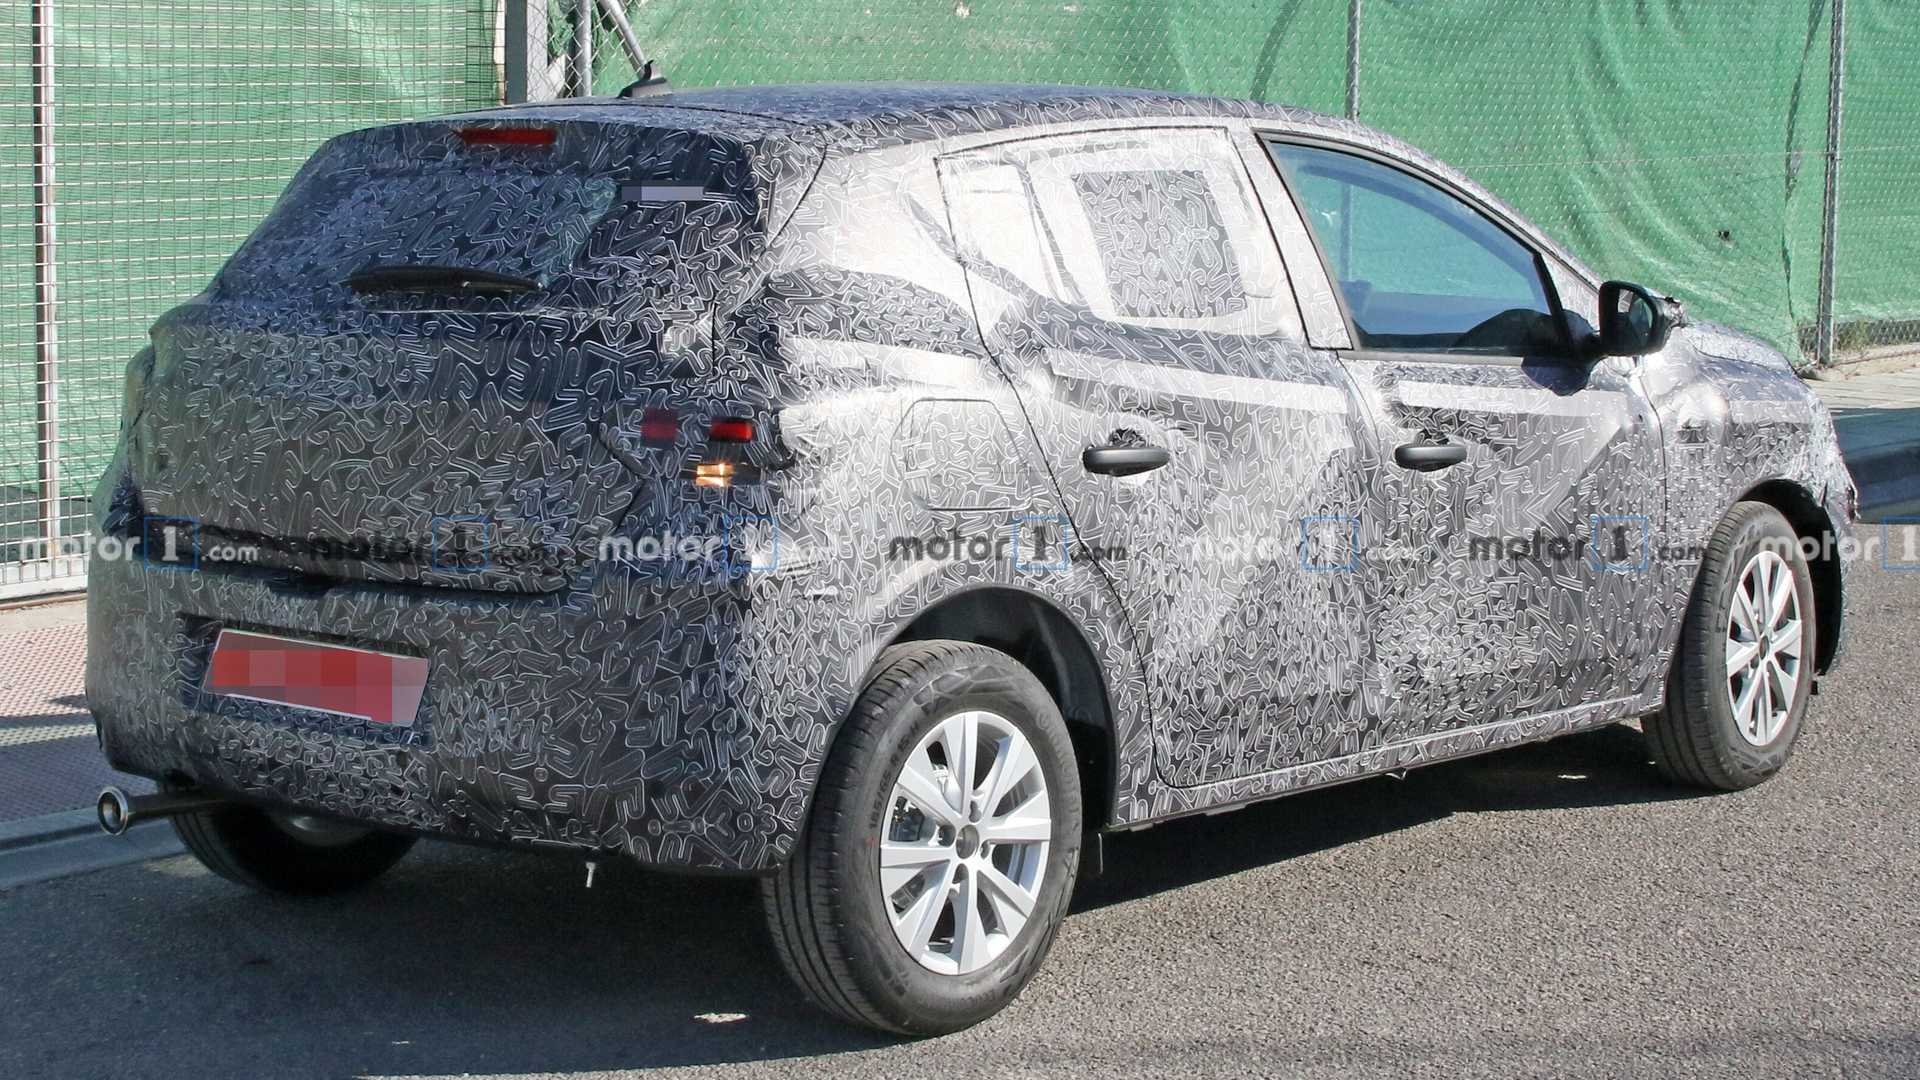 Dacia Sandero 2020 test imagini (4)